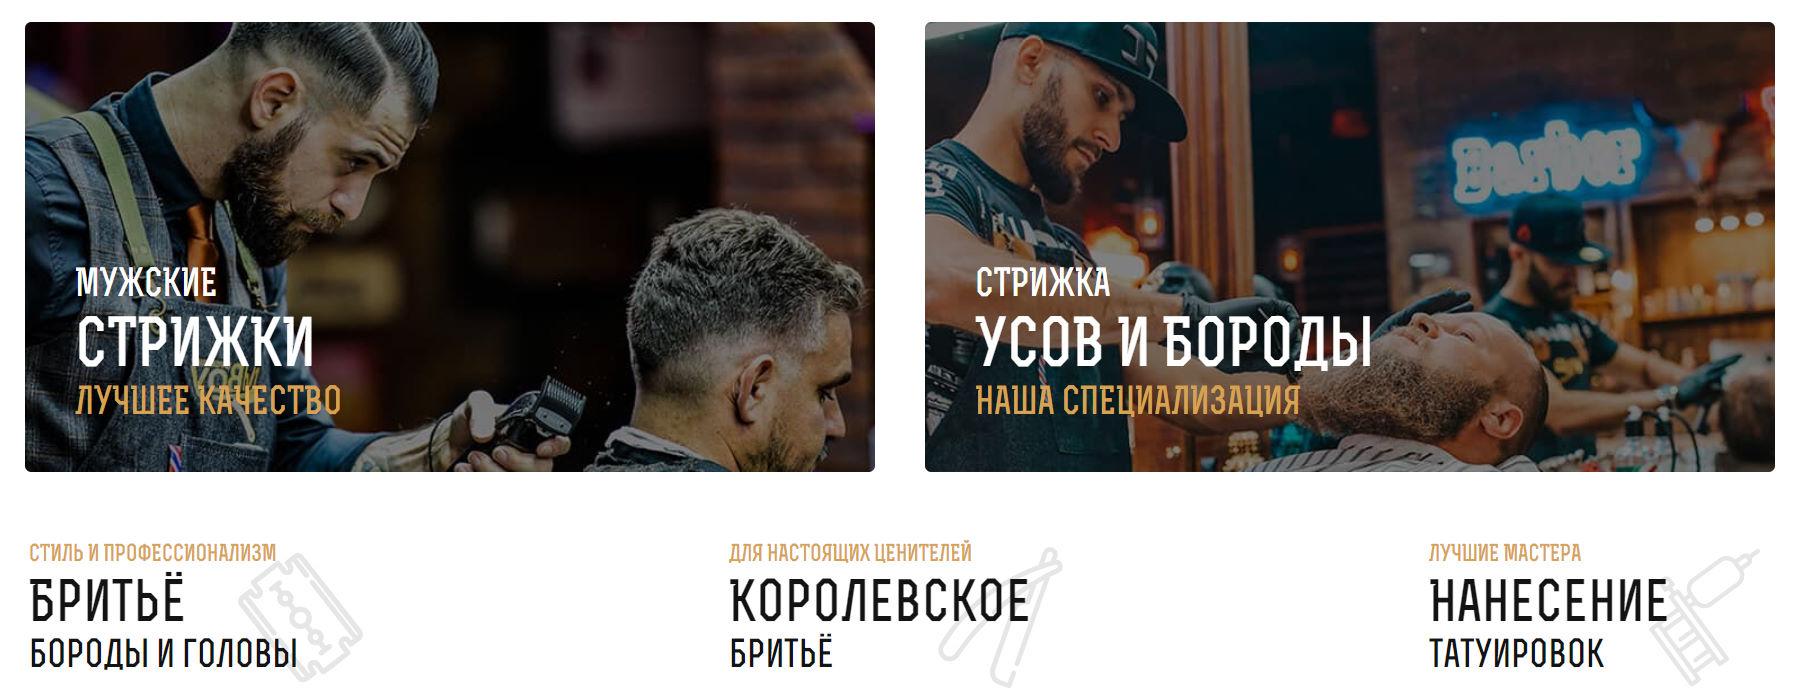 Барбершоп OldBoy Услуги